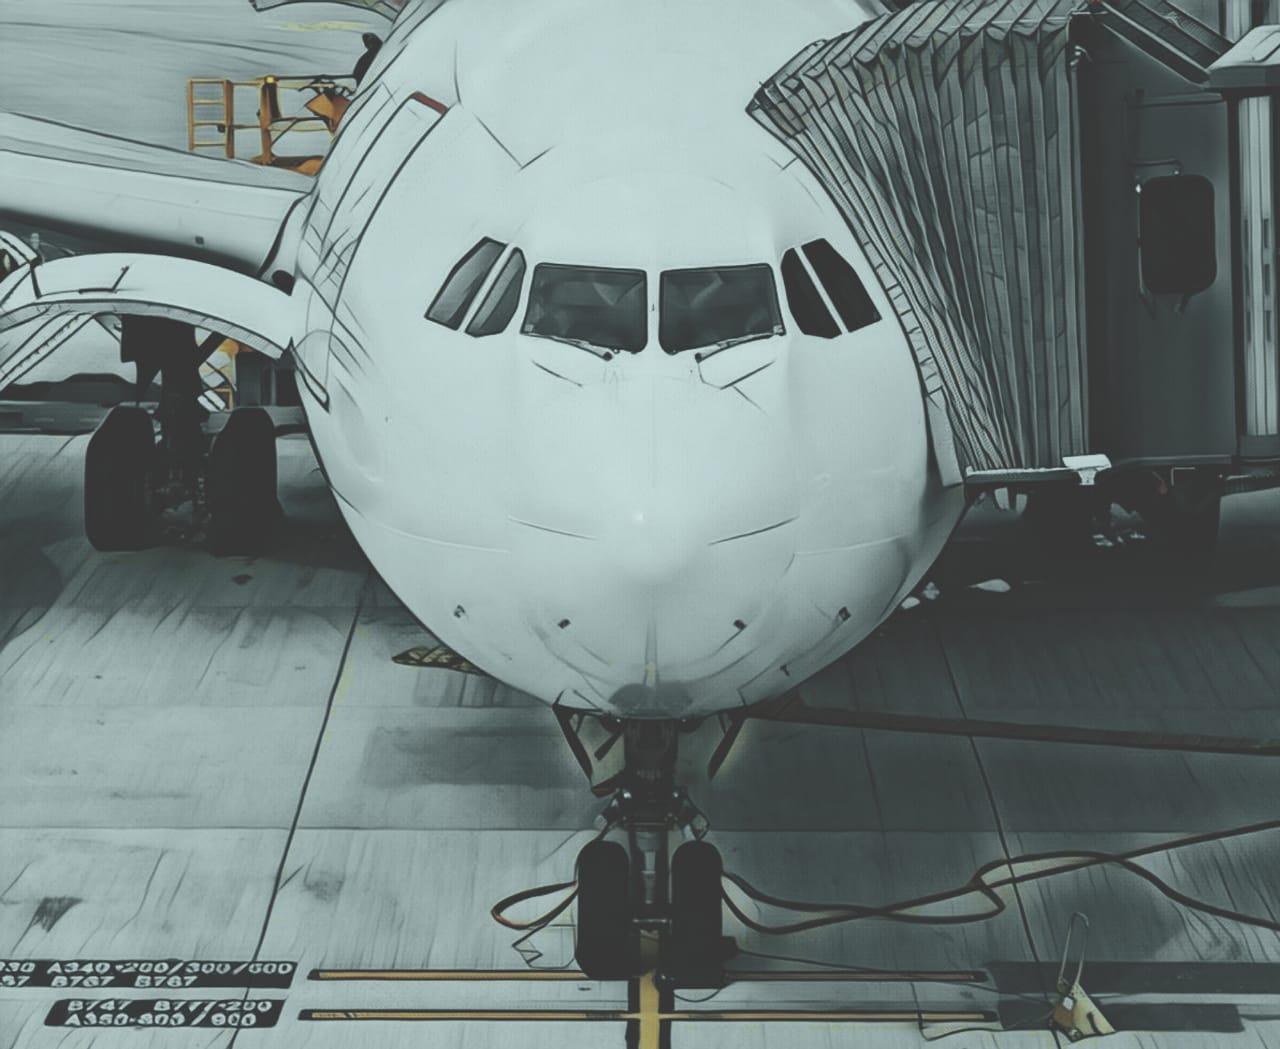 https: img.okezone.com content 2020 05 22 320 2217798 industri-penerbangan-india-mulai-beroperasi-lagi-25-mei-lv1jMuEWBG.jpeg